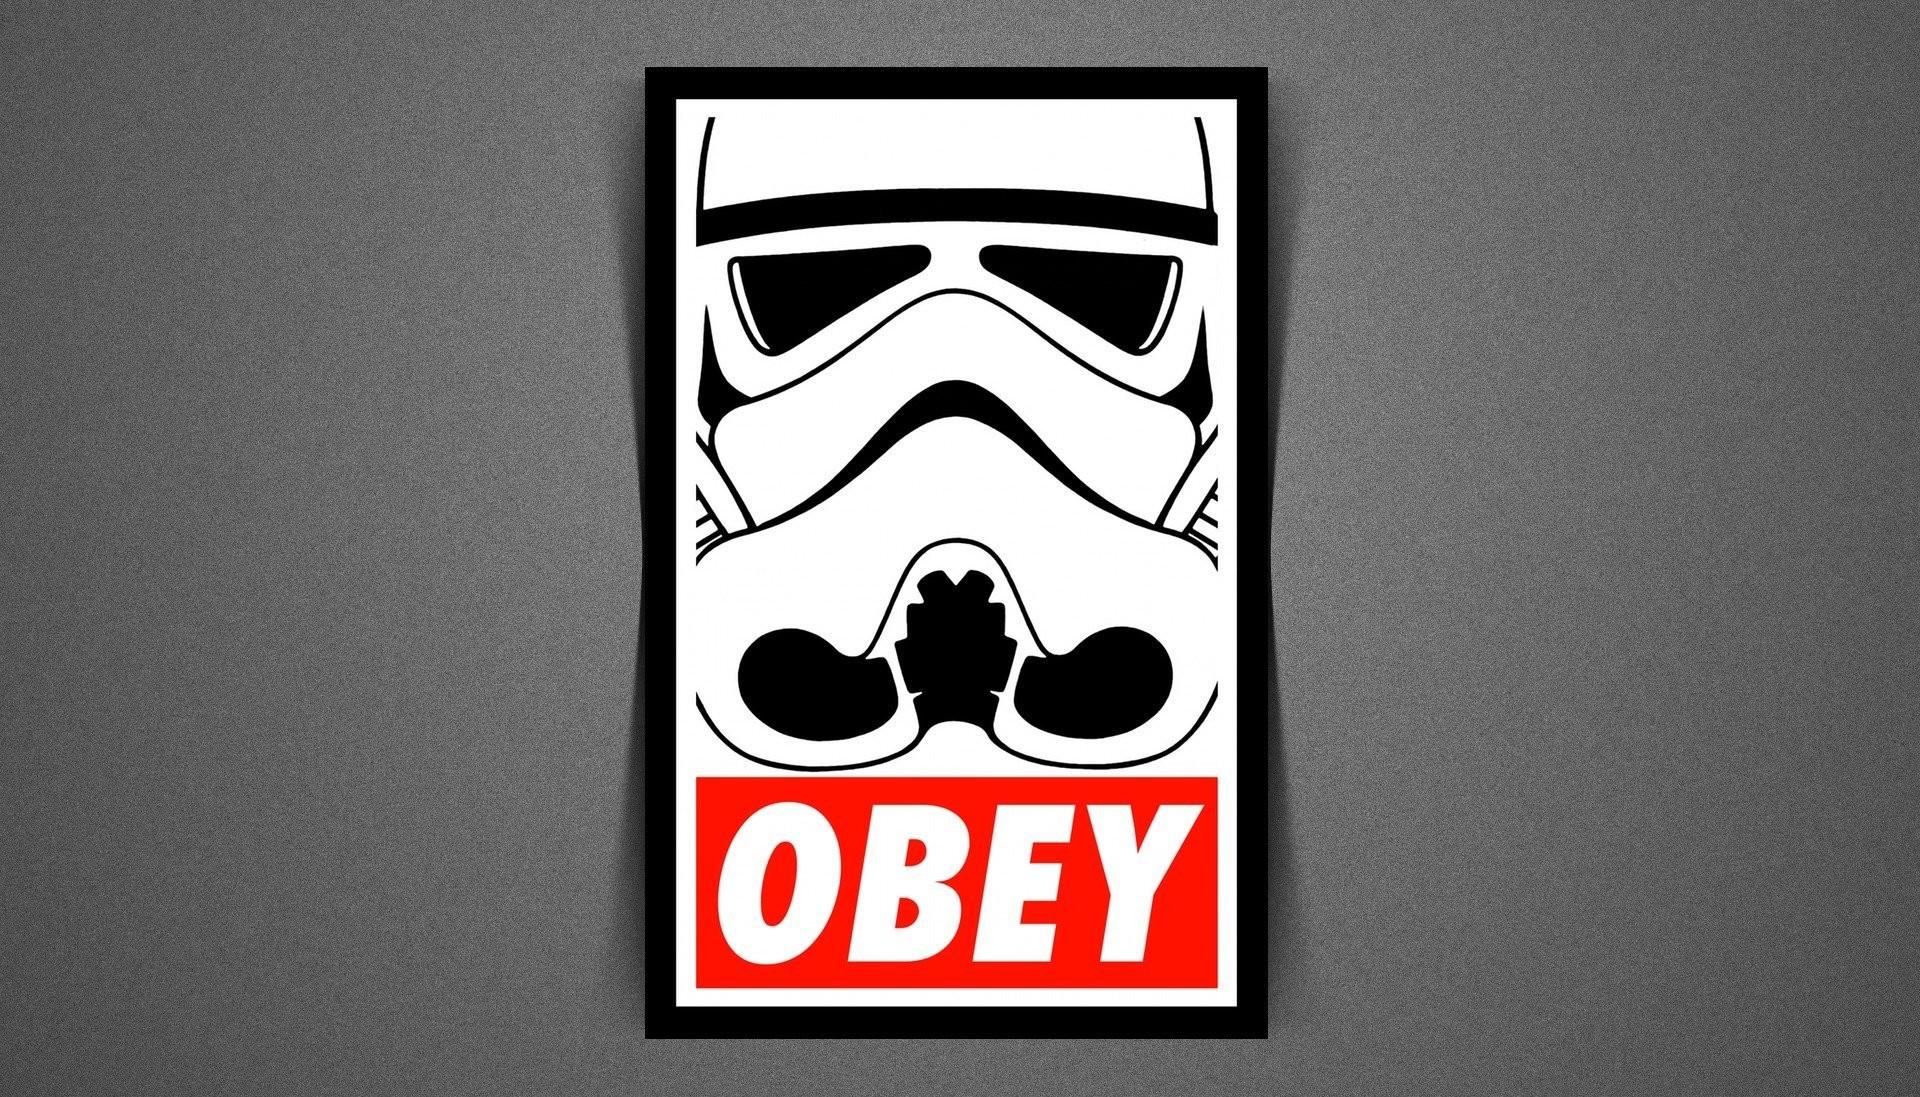 stormtrooper obey star wars empire star wars